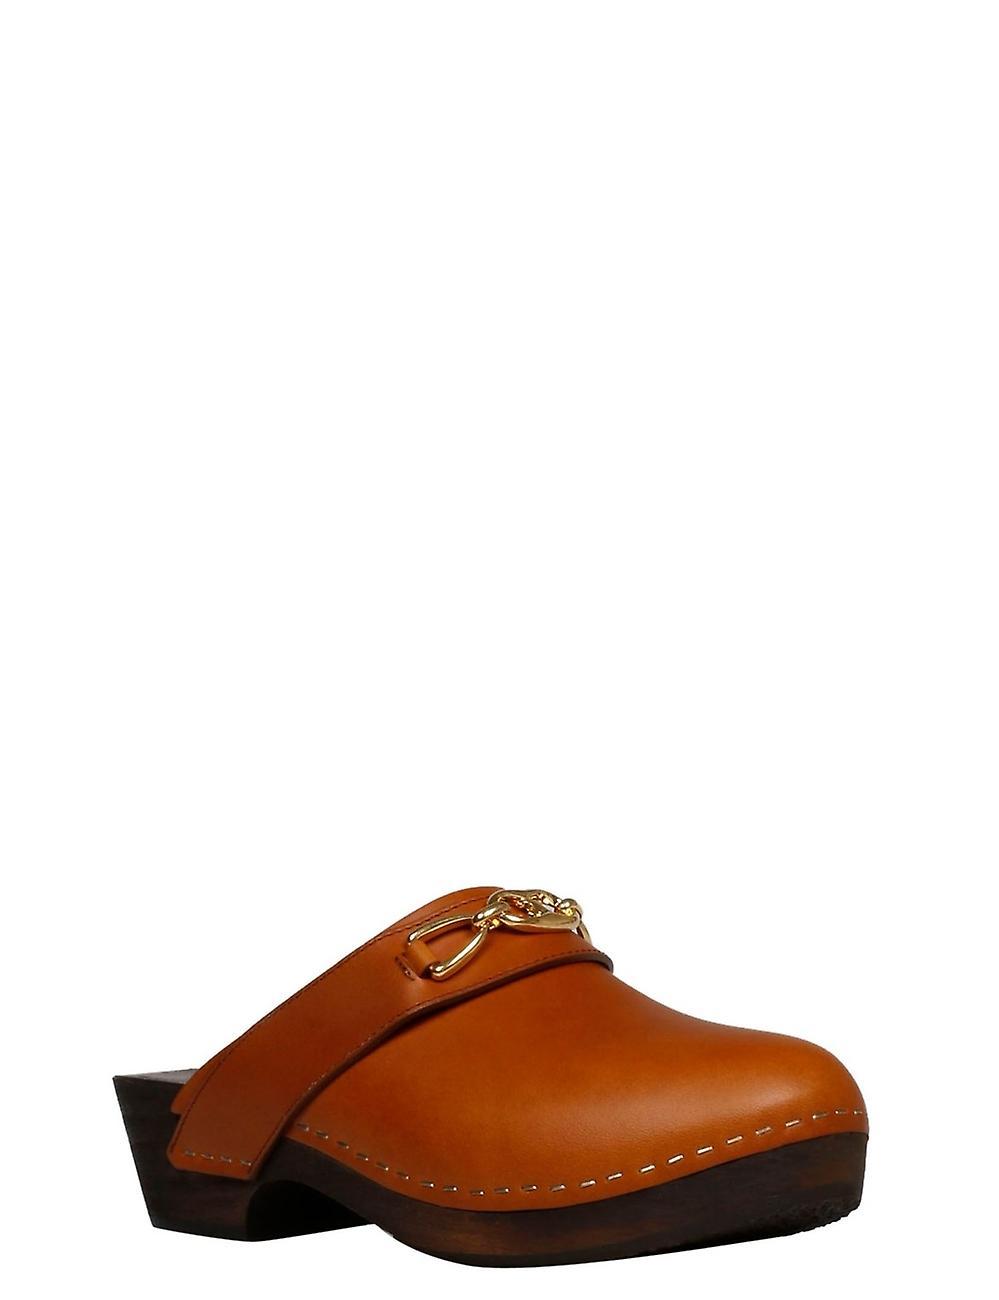 Céline 336623363c04lu Women's Brown Leather Slippers